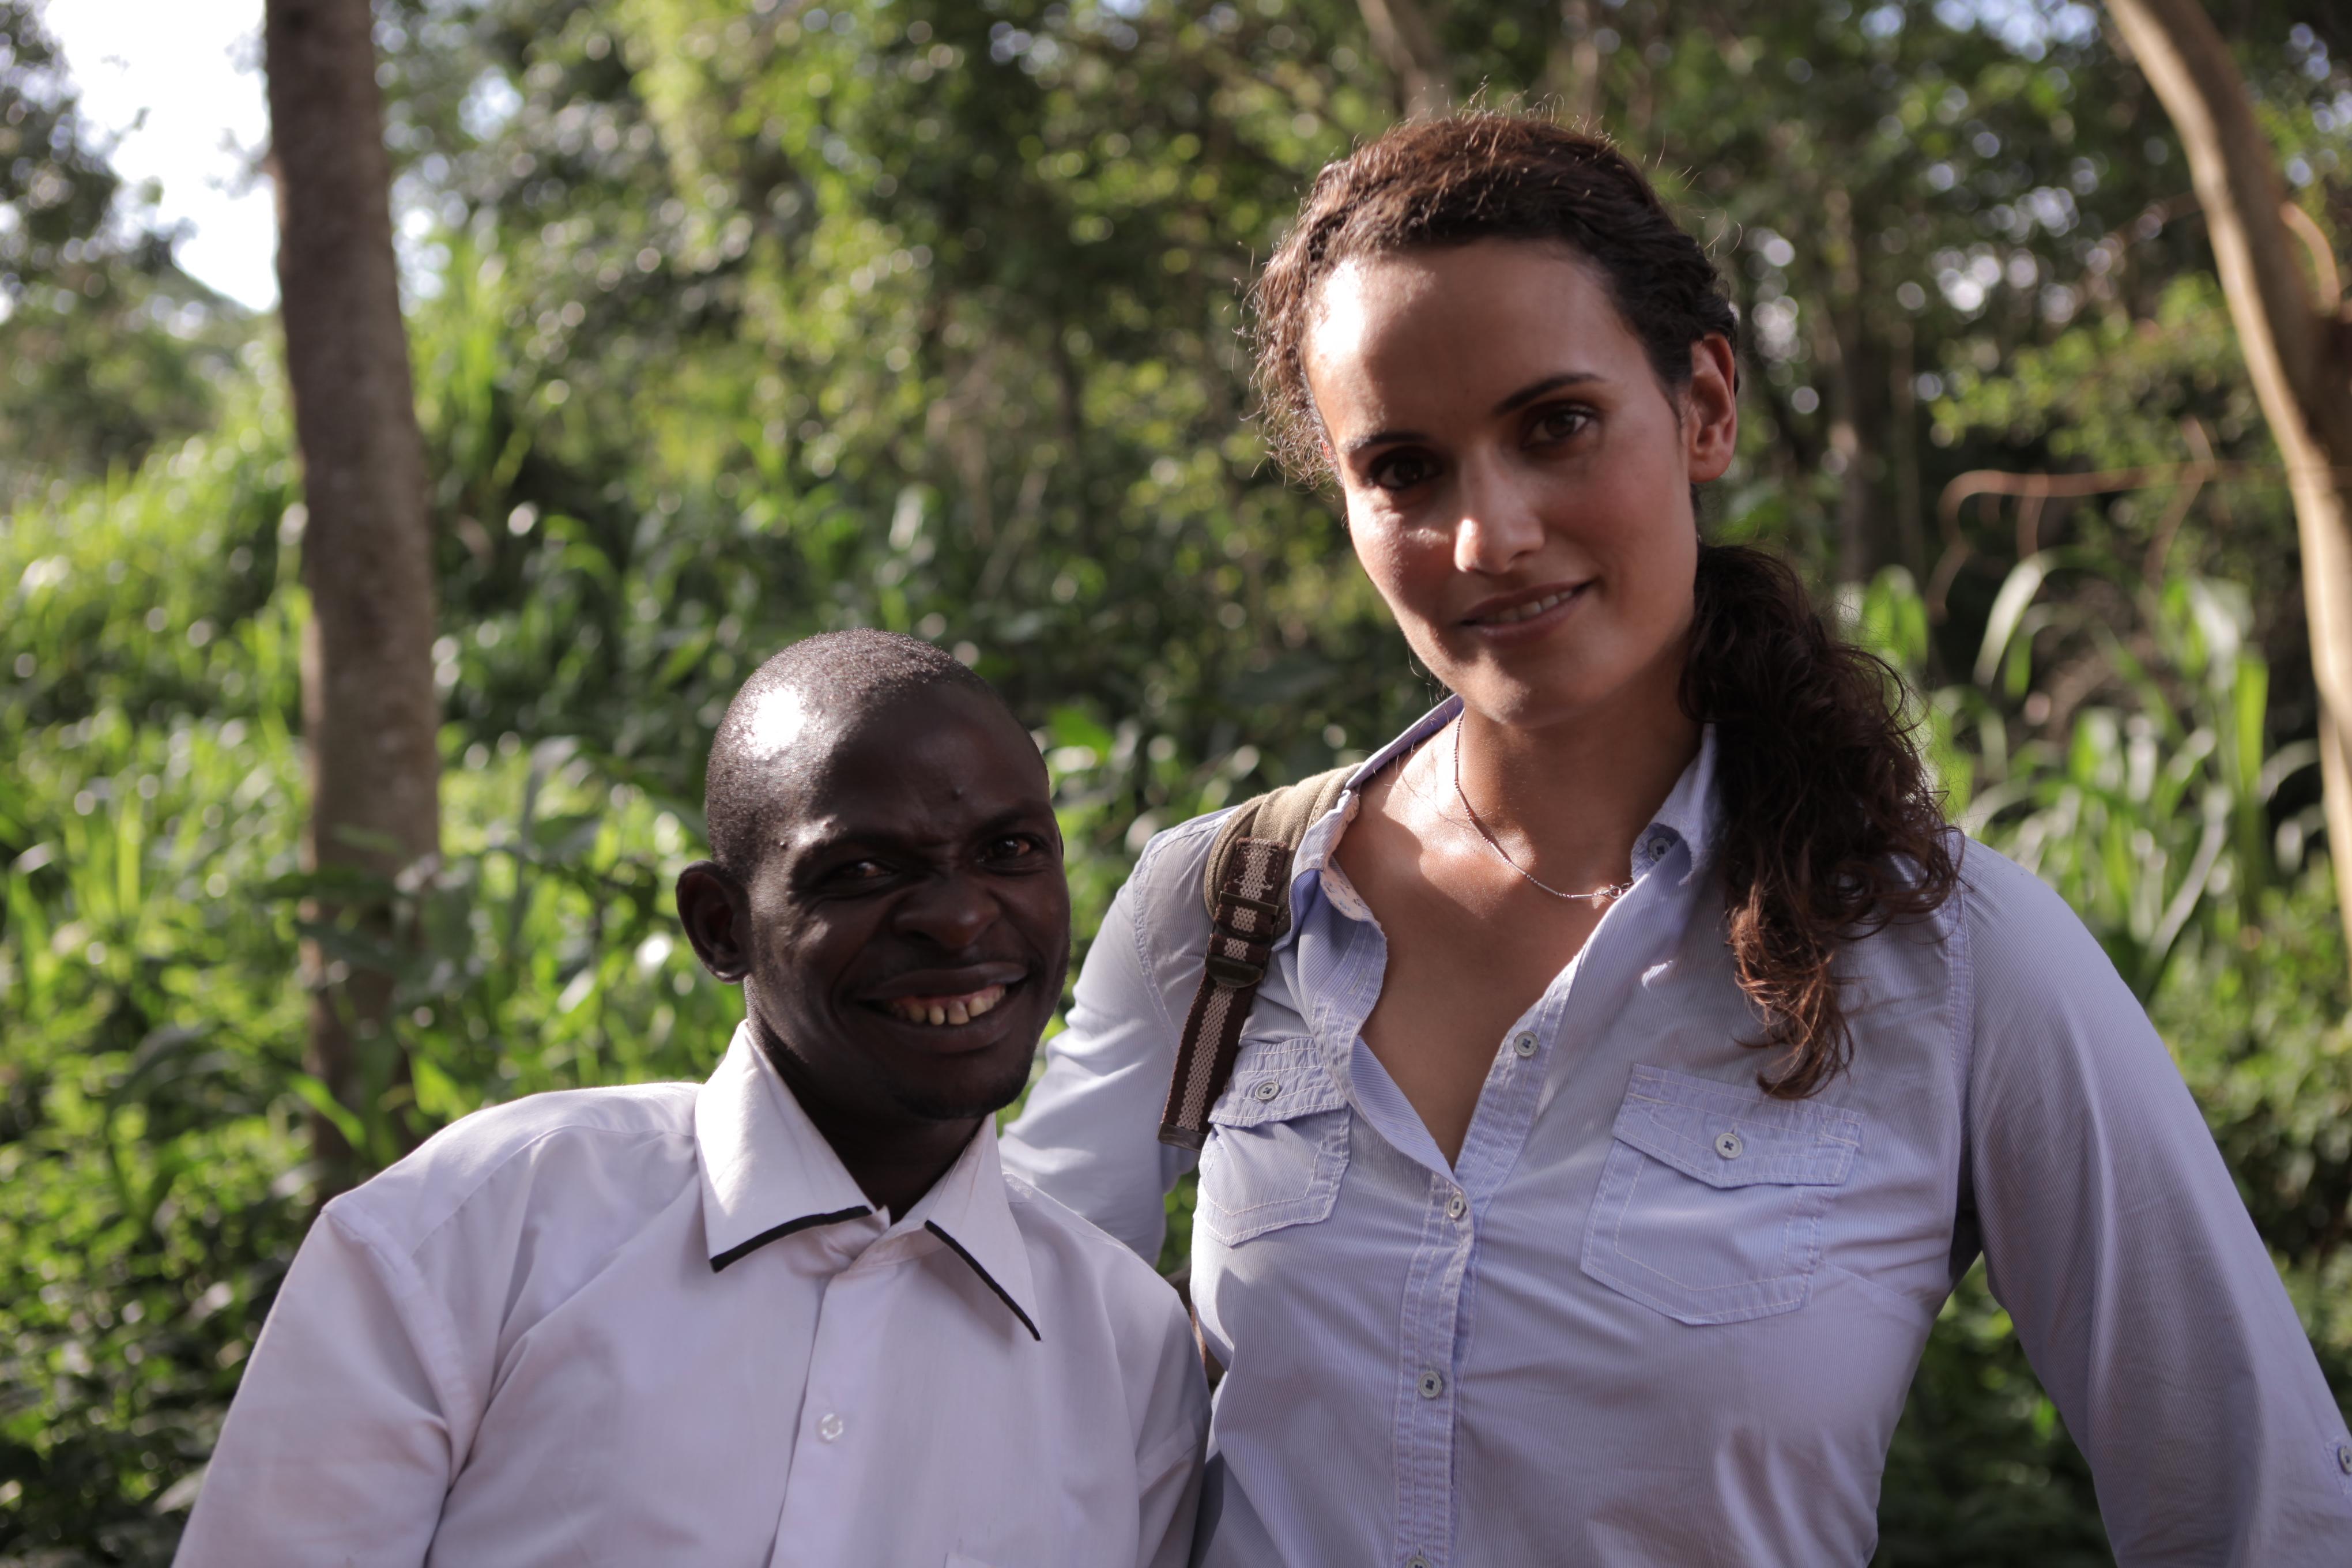 Картинки по запросу monkey boy of uganda